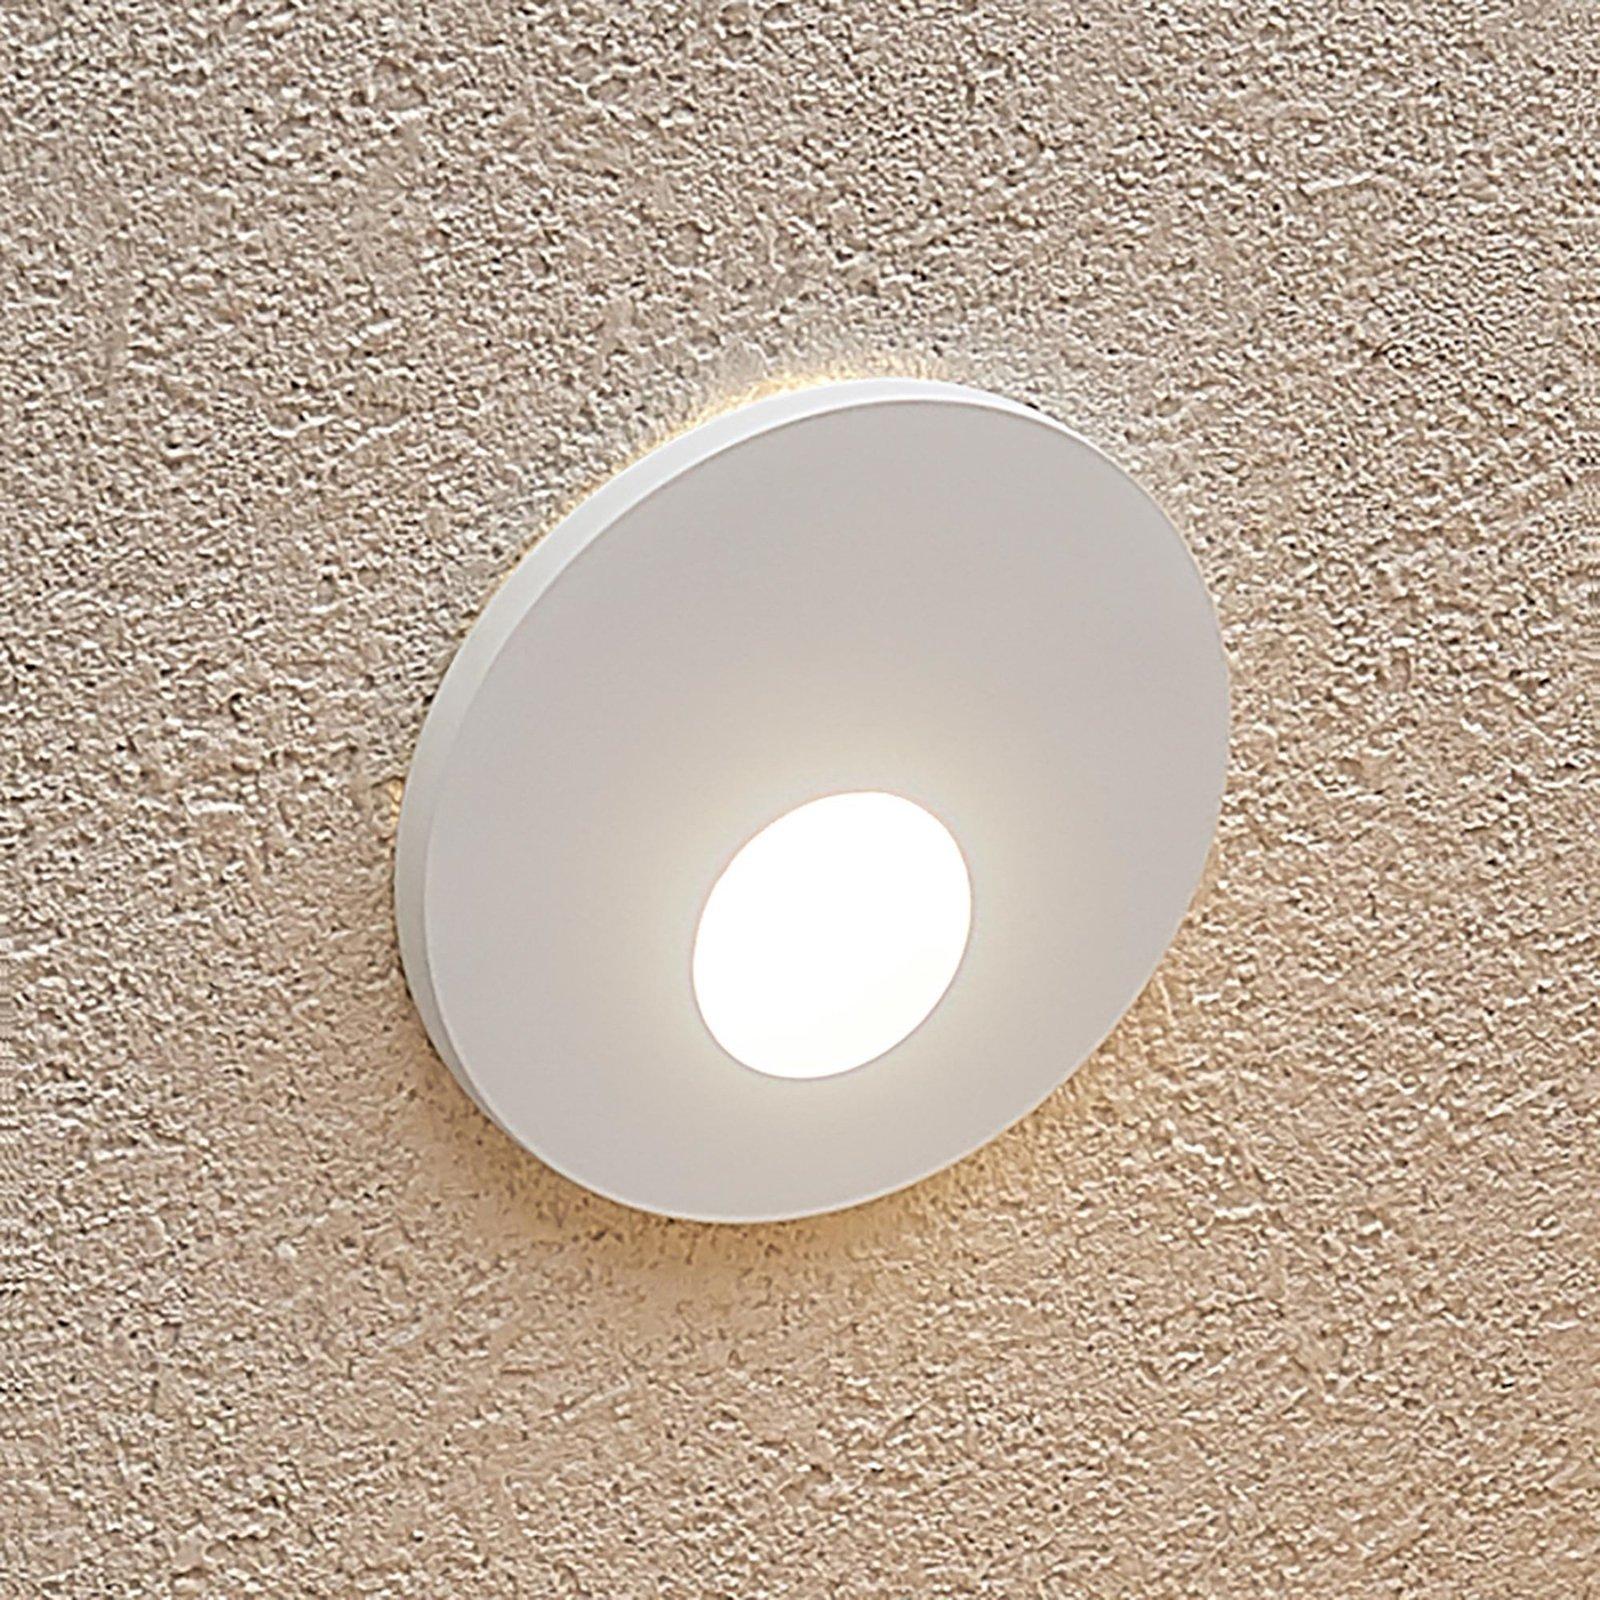 Arcchio Vexi LED-innfellingslampe, rund, hvit